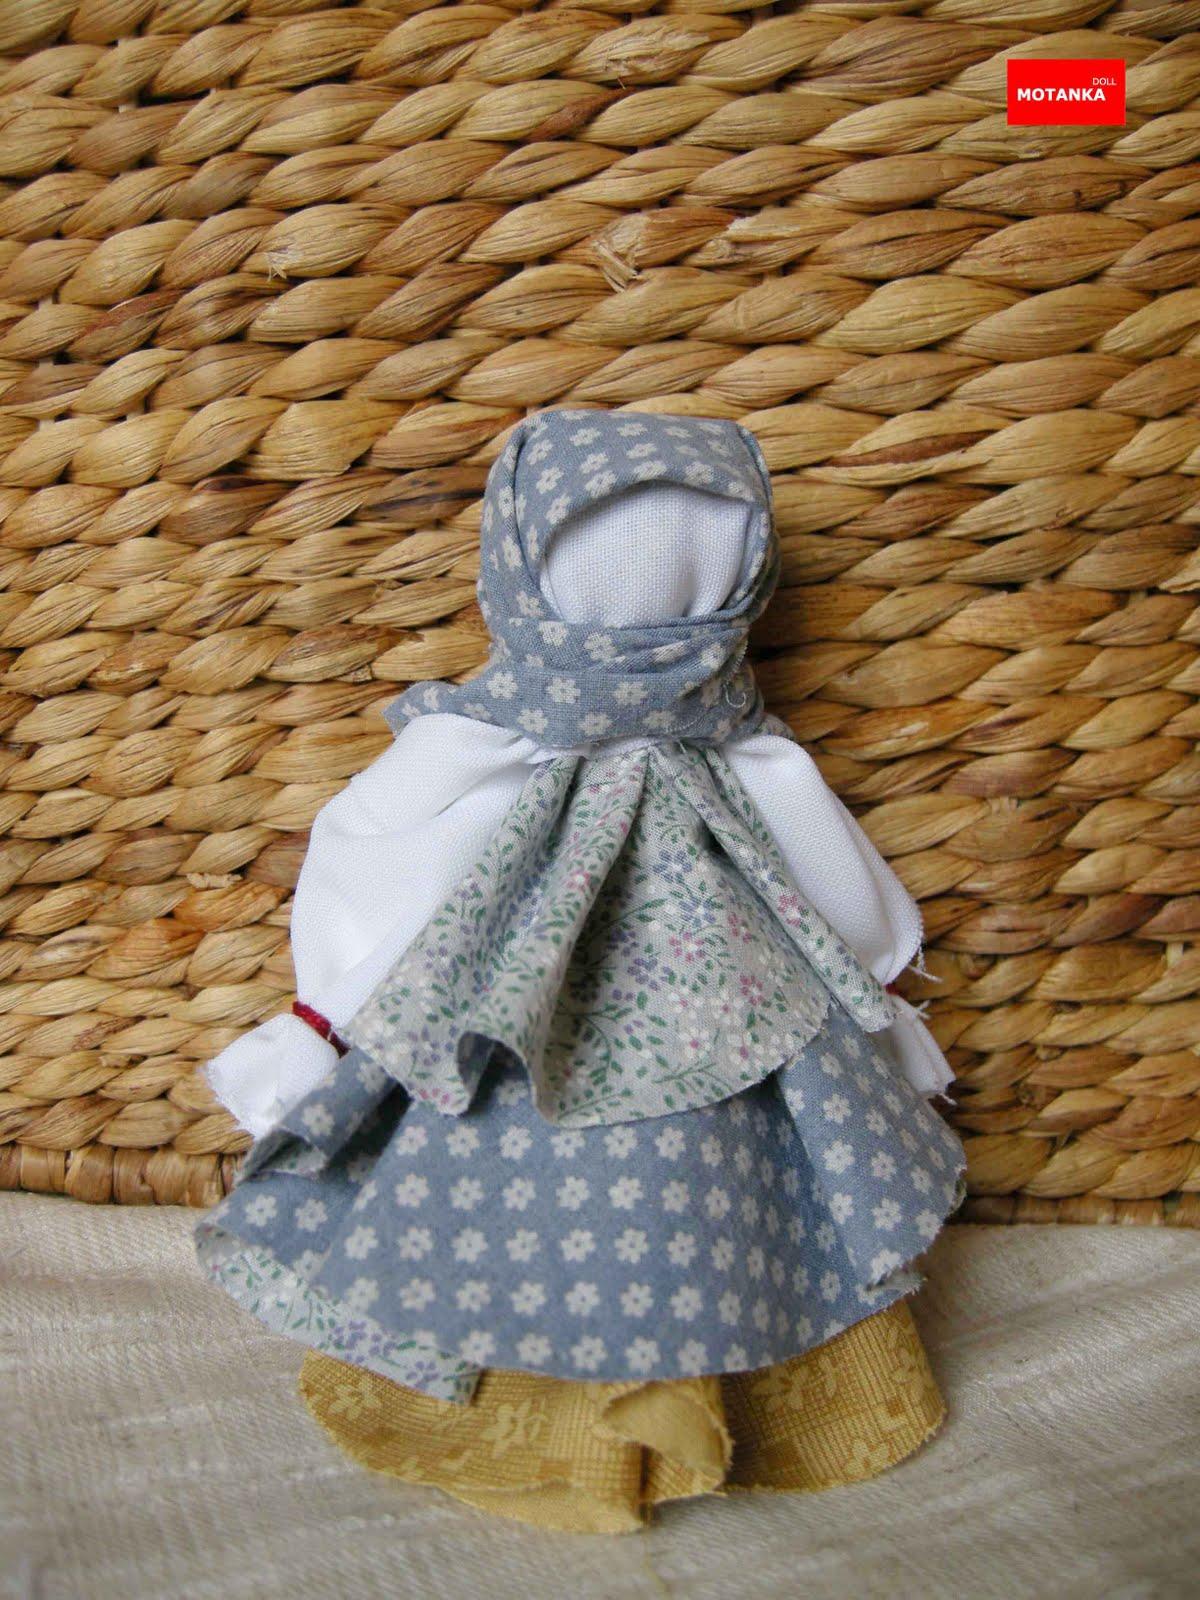 Куклы марионетки из ткани своими руками